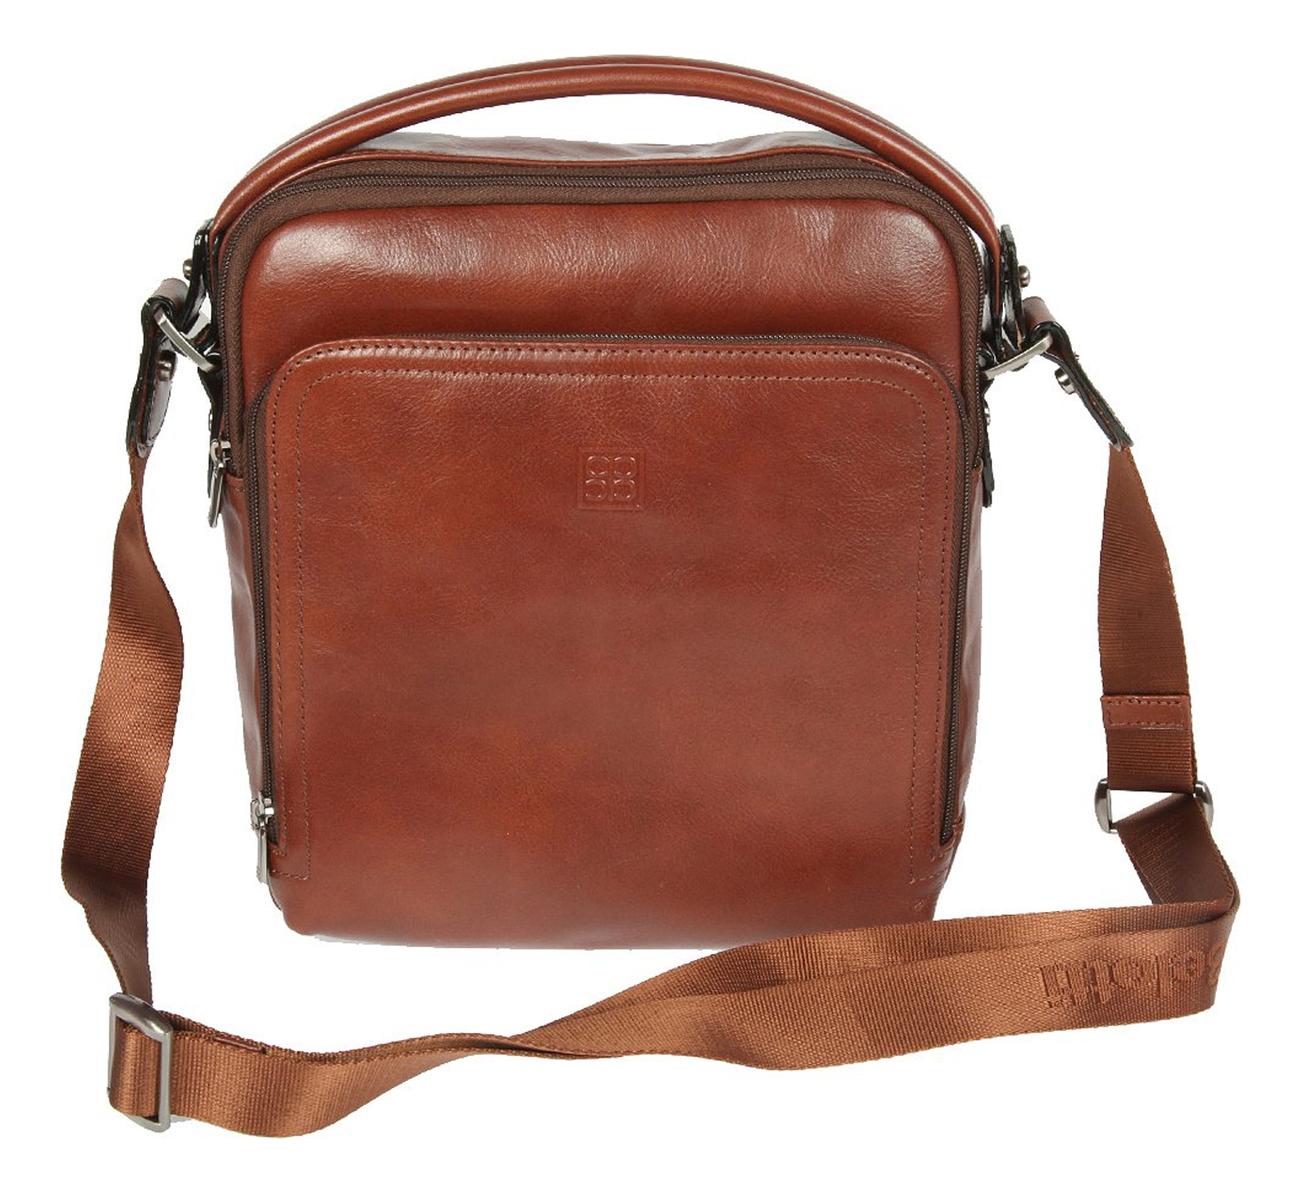 Планшет Milano Brown 9188 (коричневый) планшет